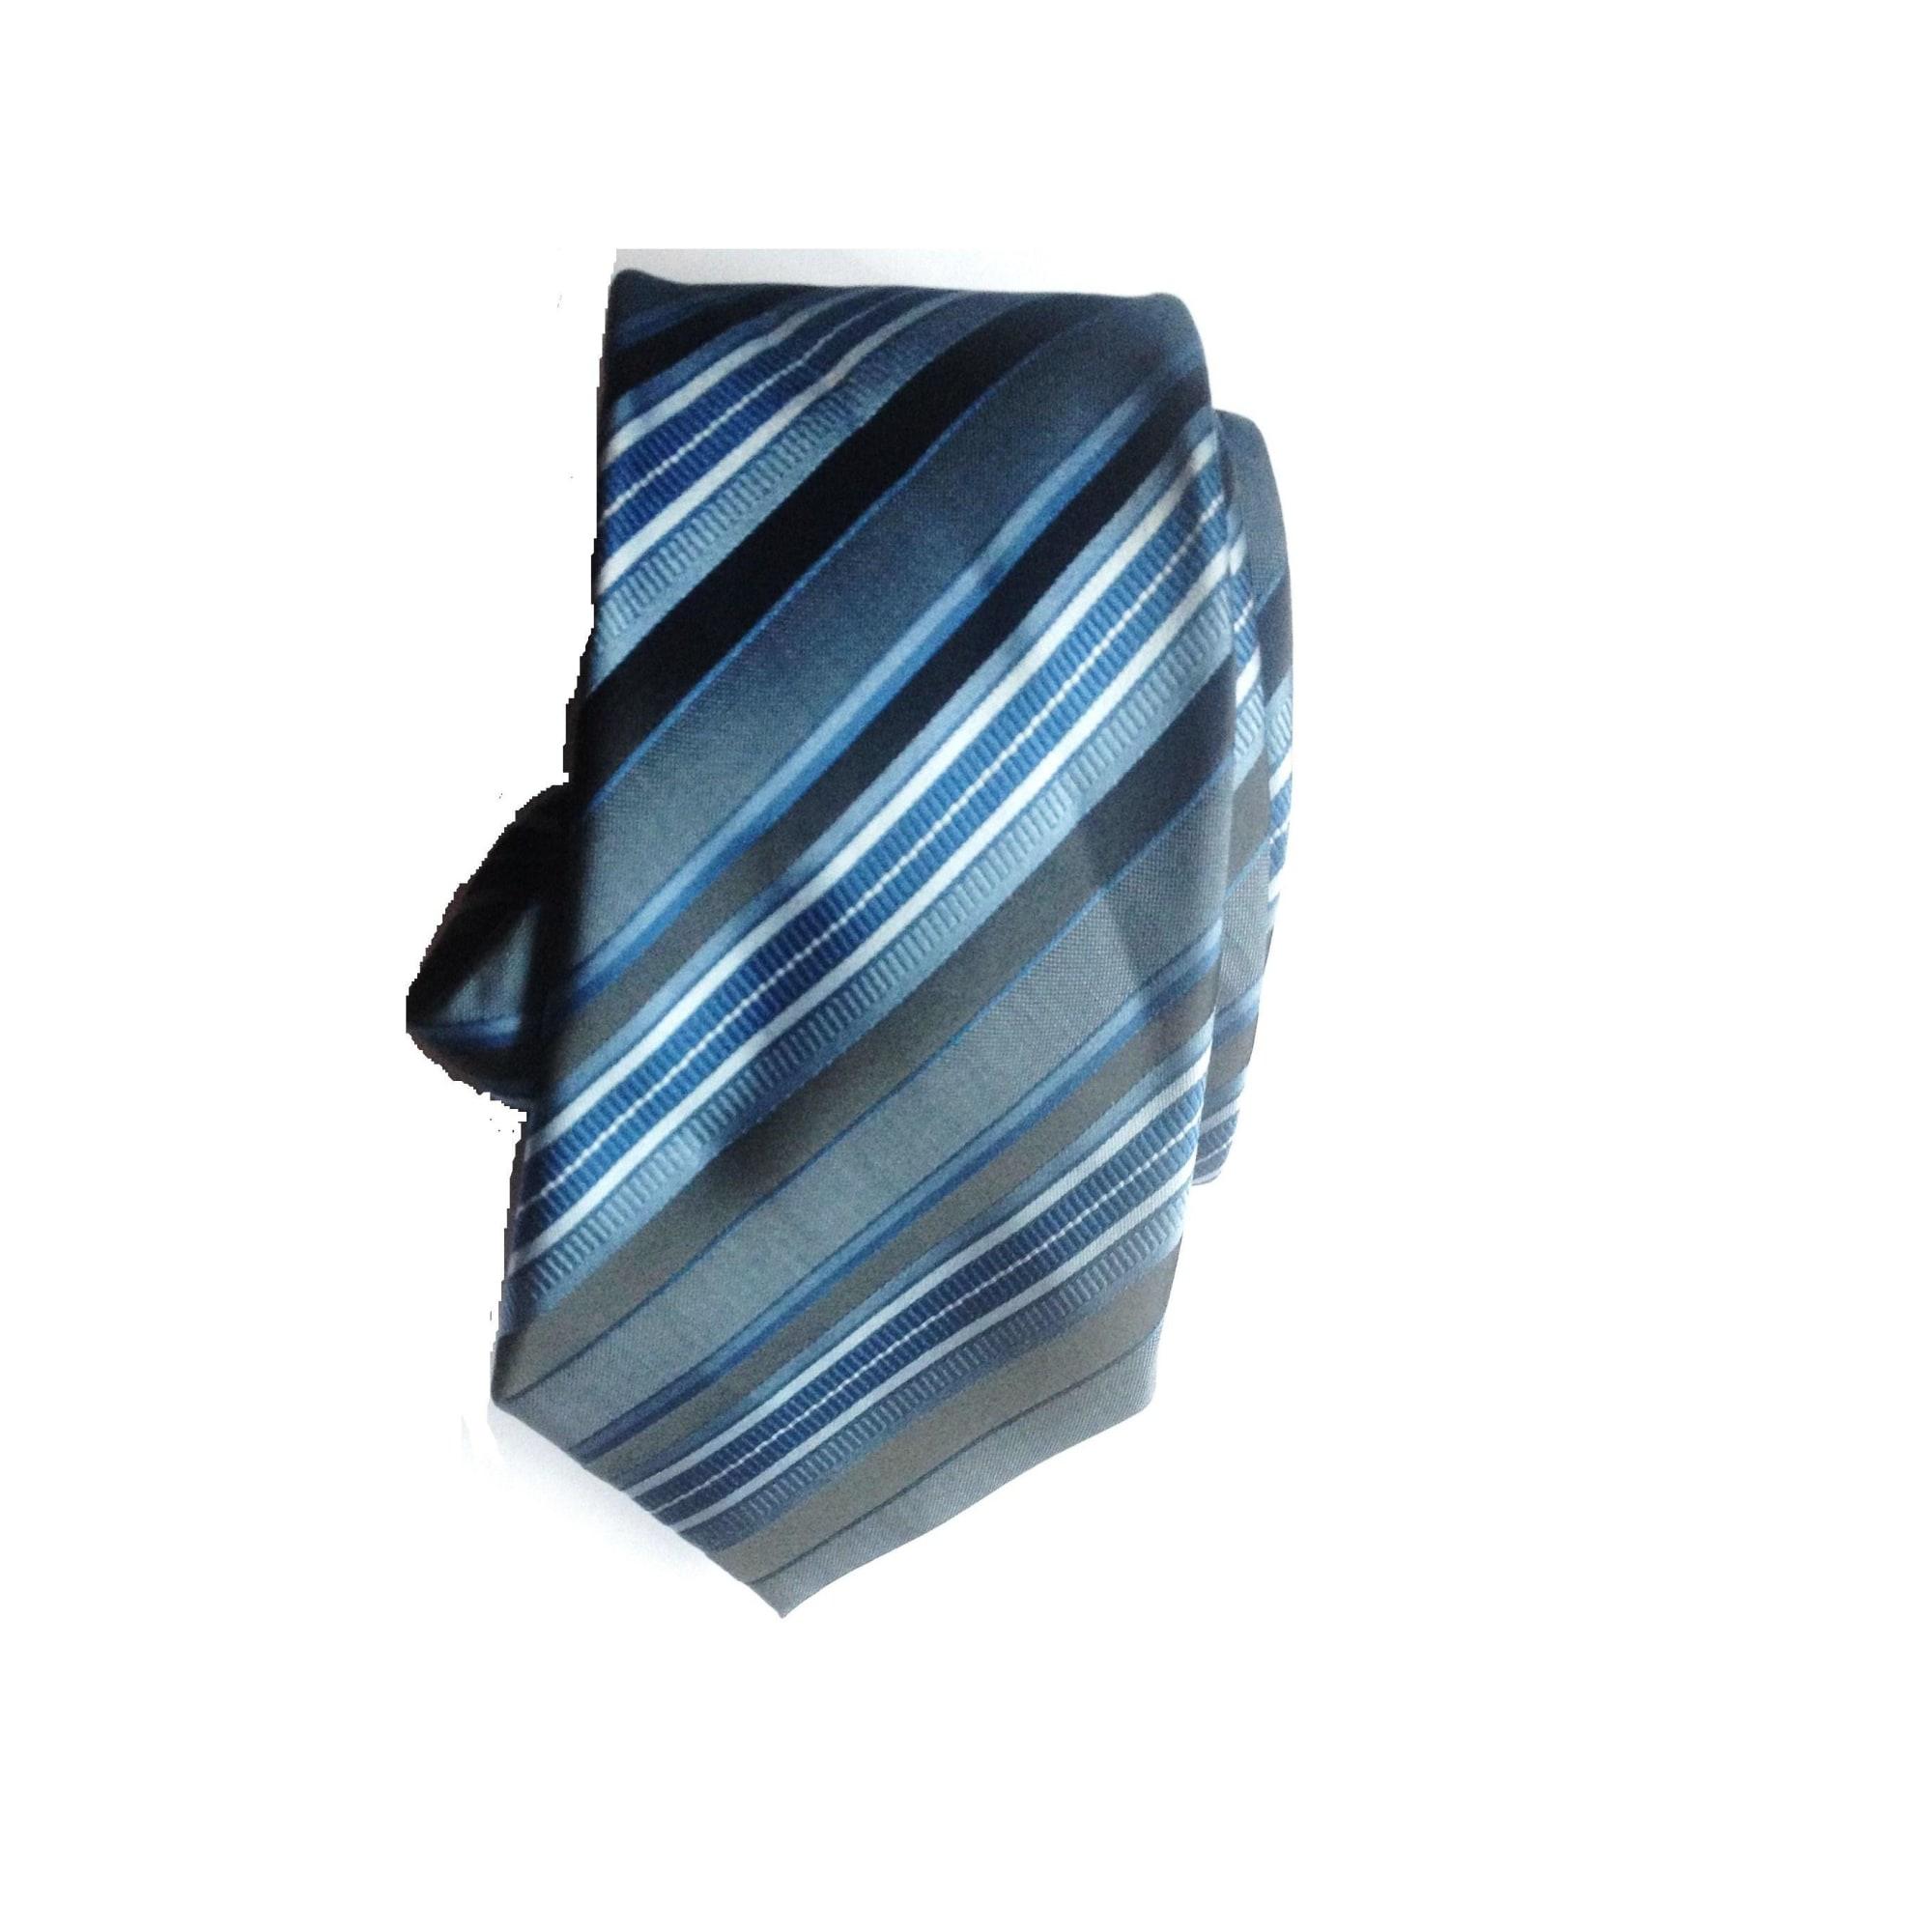 Cravate BRICE bleu foncé